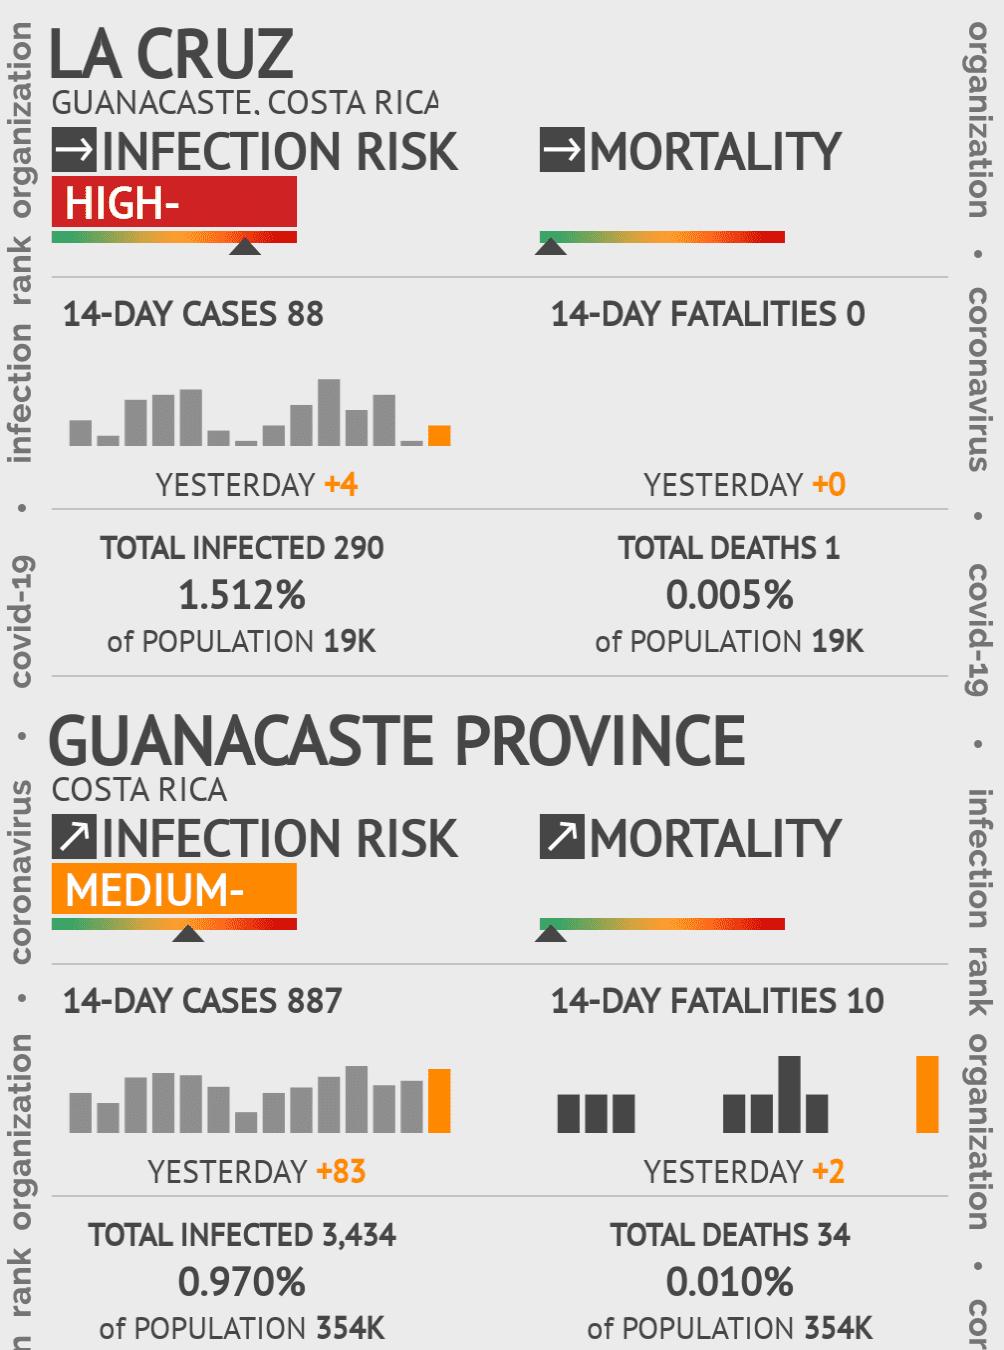 La Cruz Coronavirus Covid-19 Risk of Infection on January 04, 2021